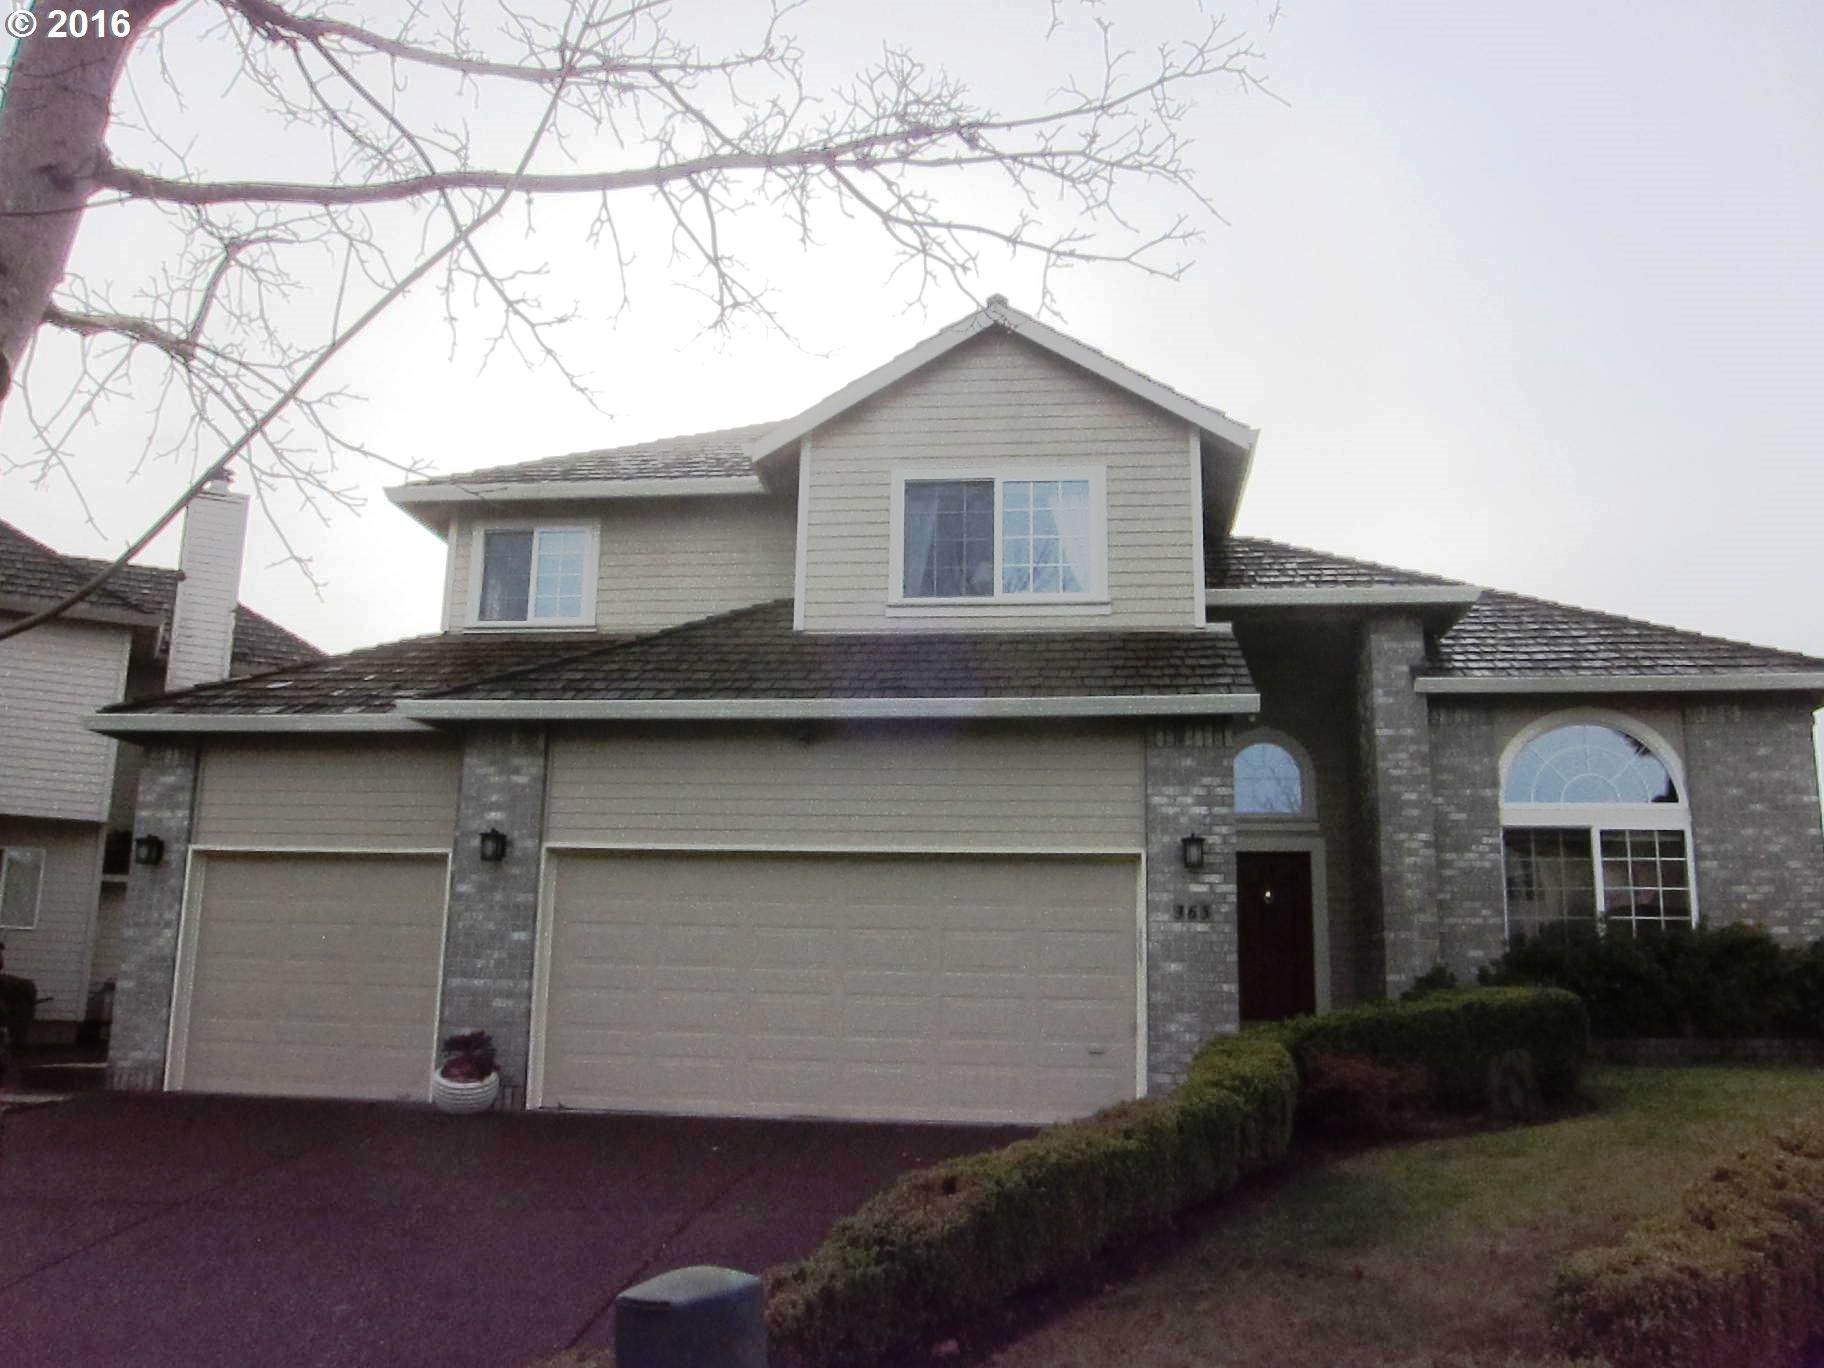 365 SW 169th Ct, Beaverton, OR